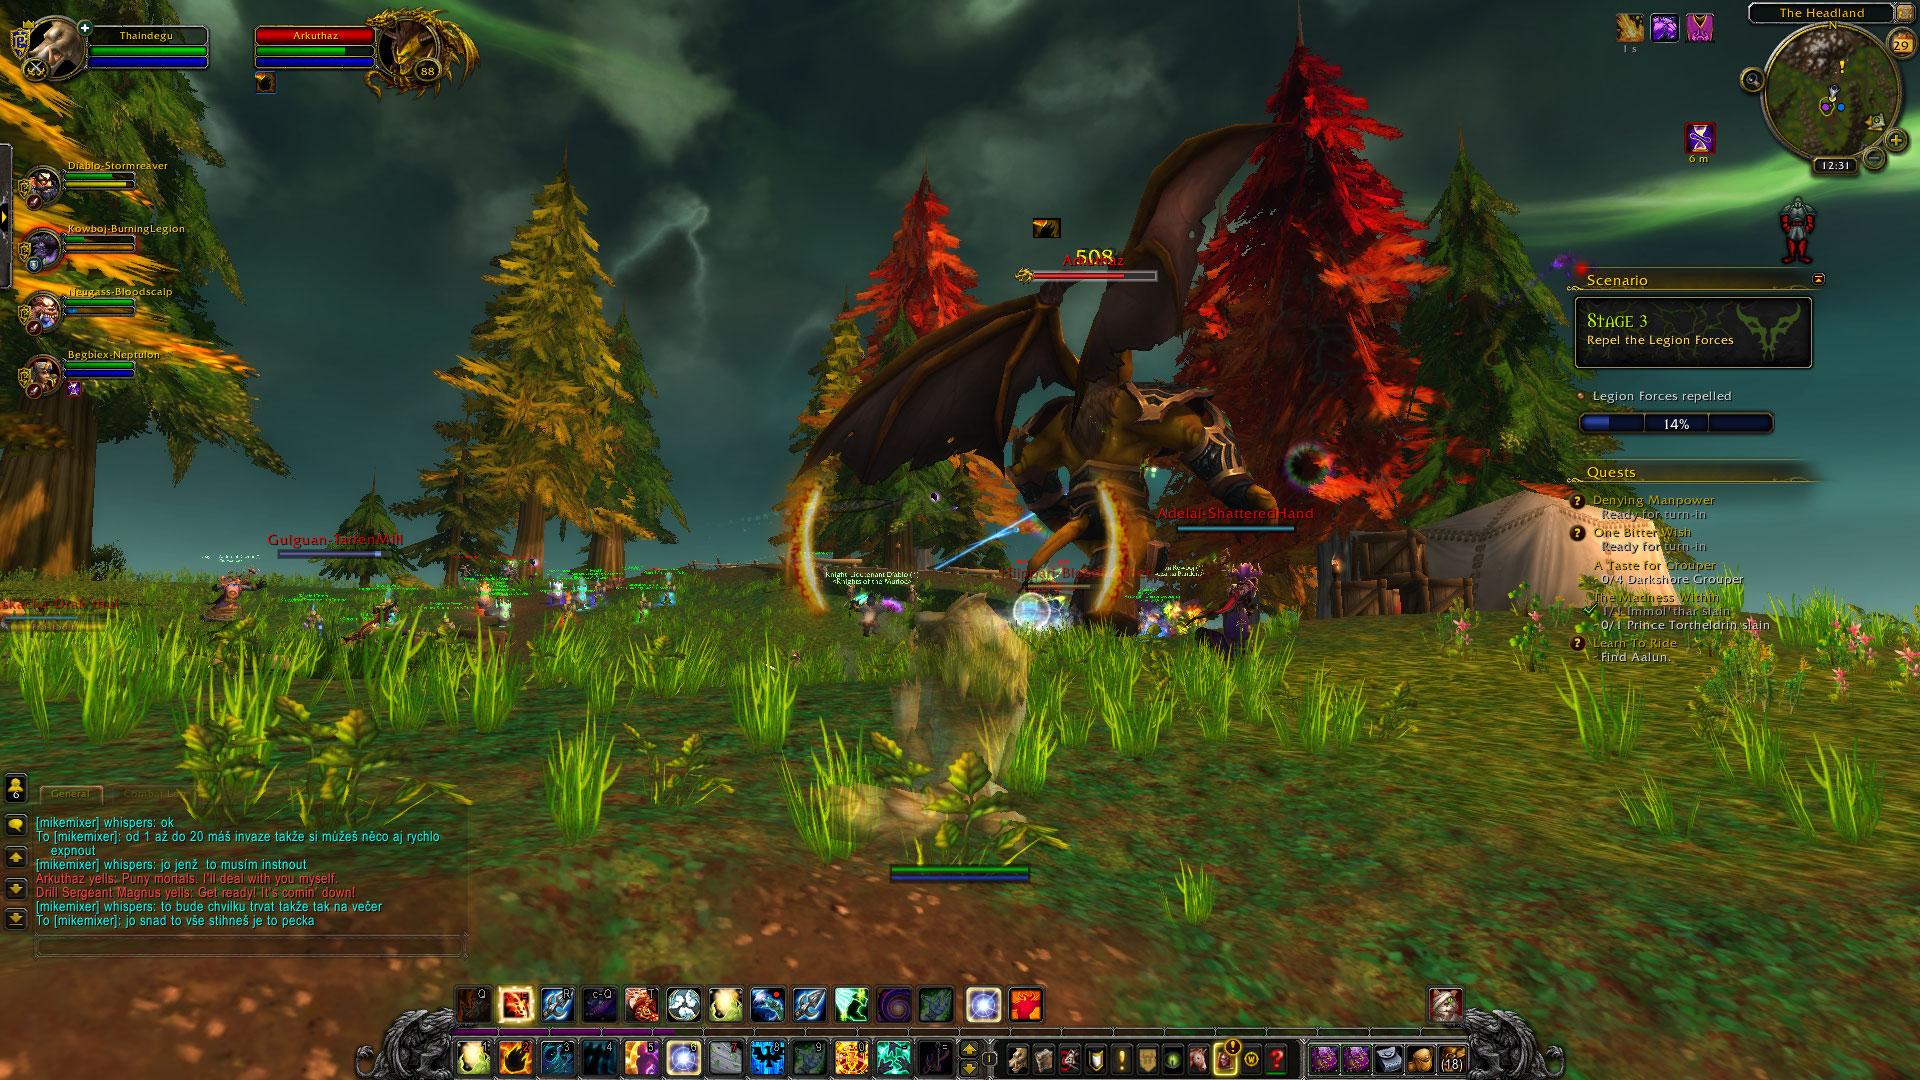 World of Warcraft: Legion fotoseriál - Plamenná legie přichází 129834